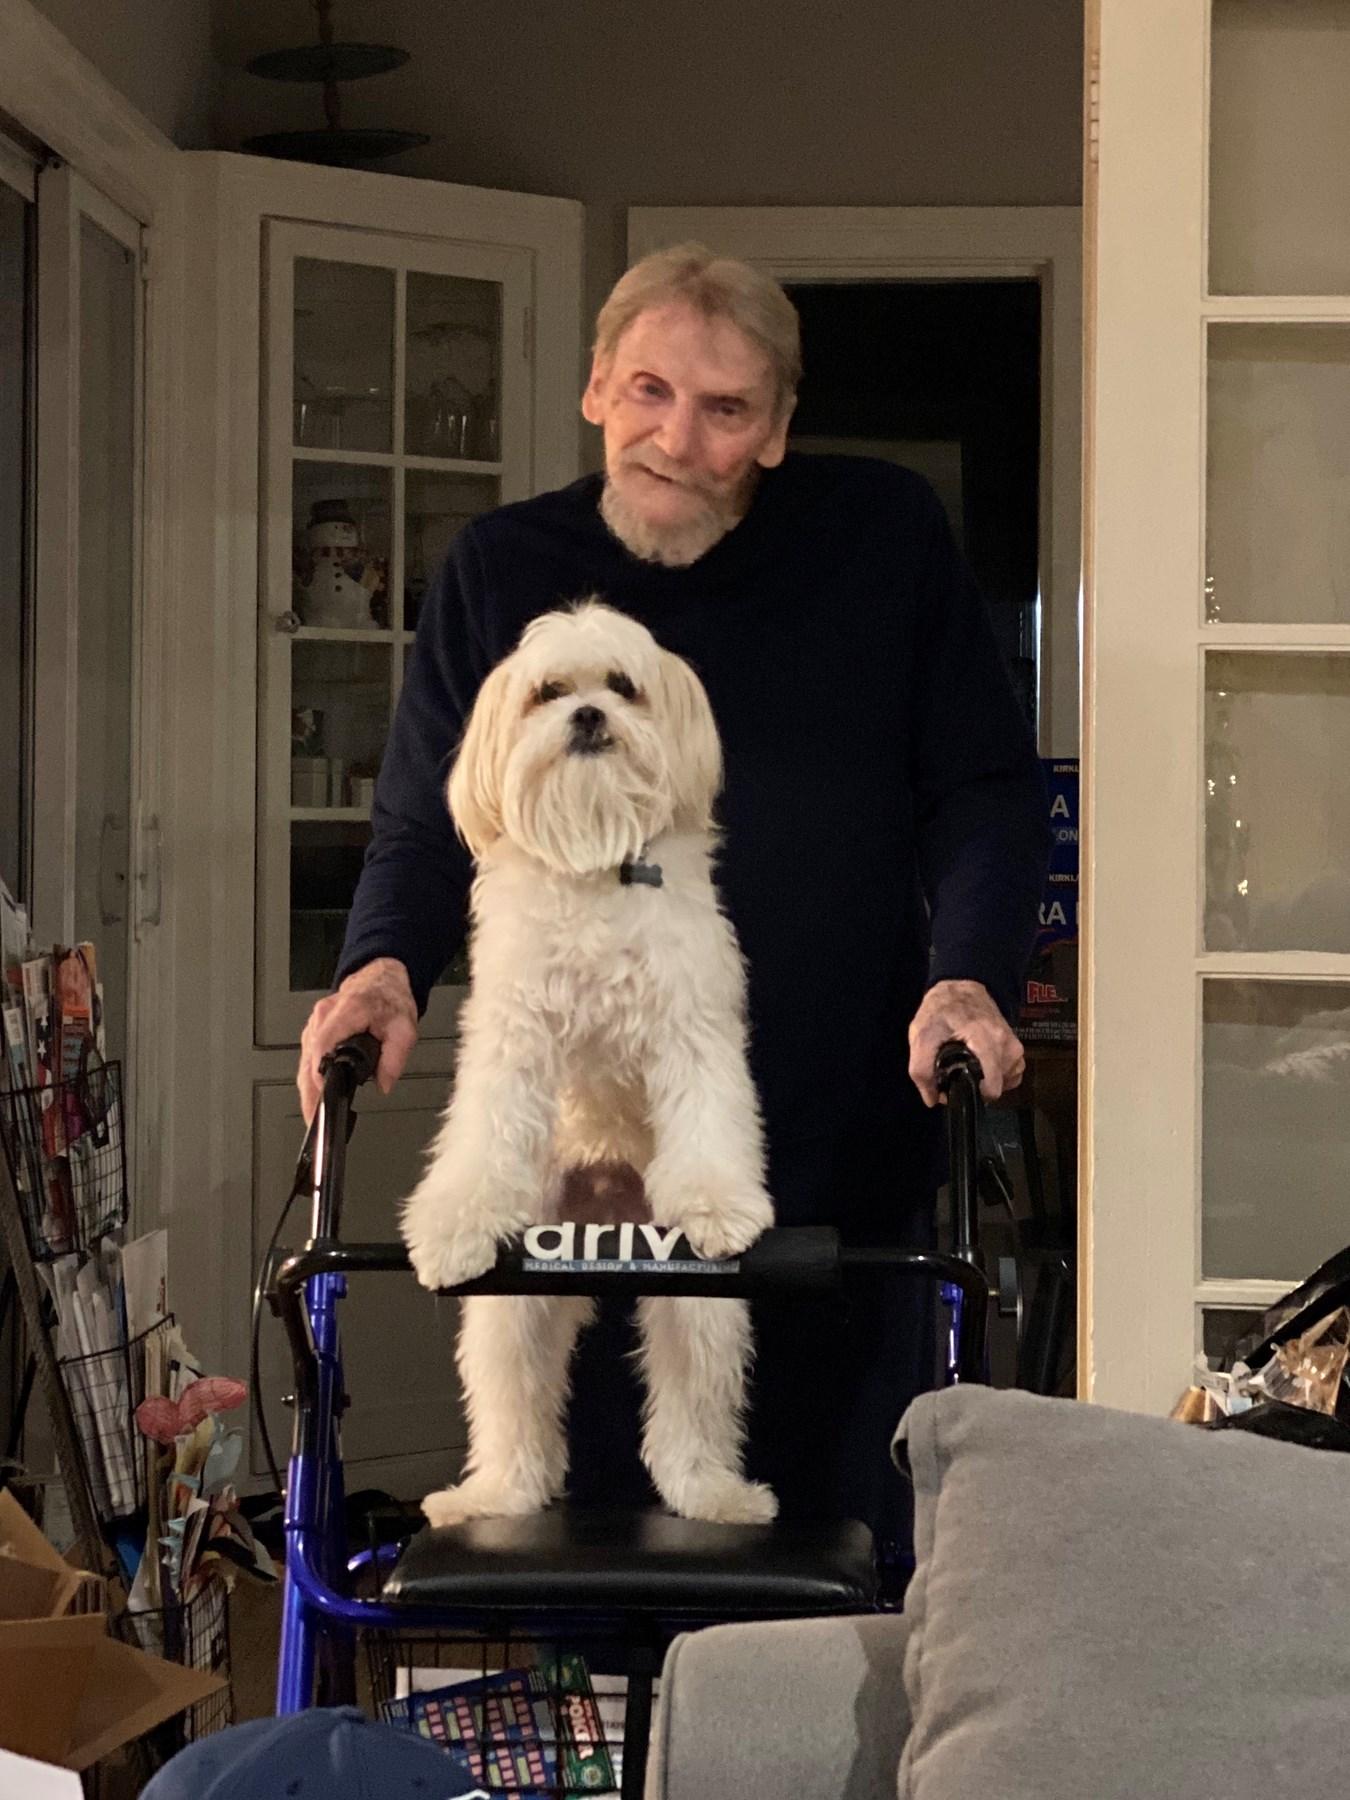 Larry Hogan Obituary - North Hollywood, CA